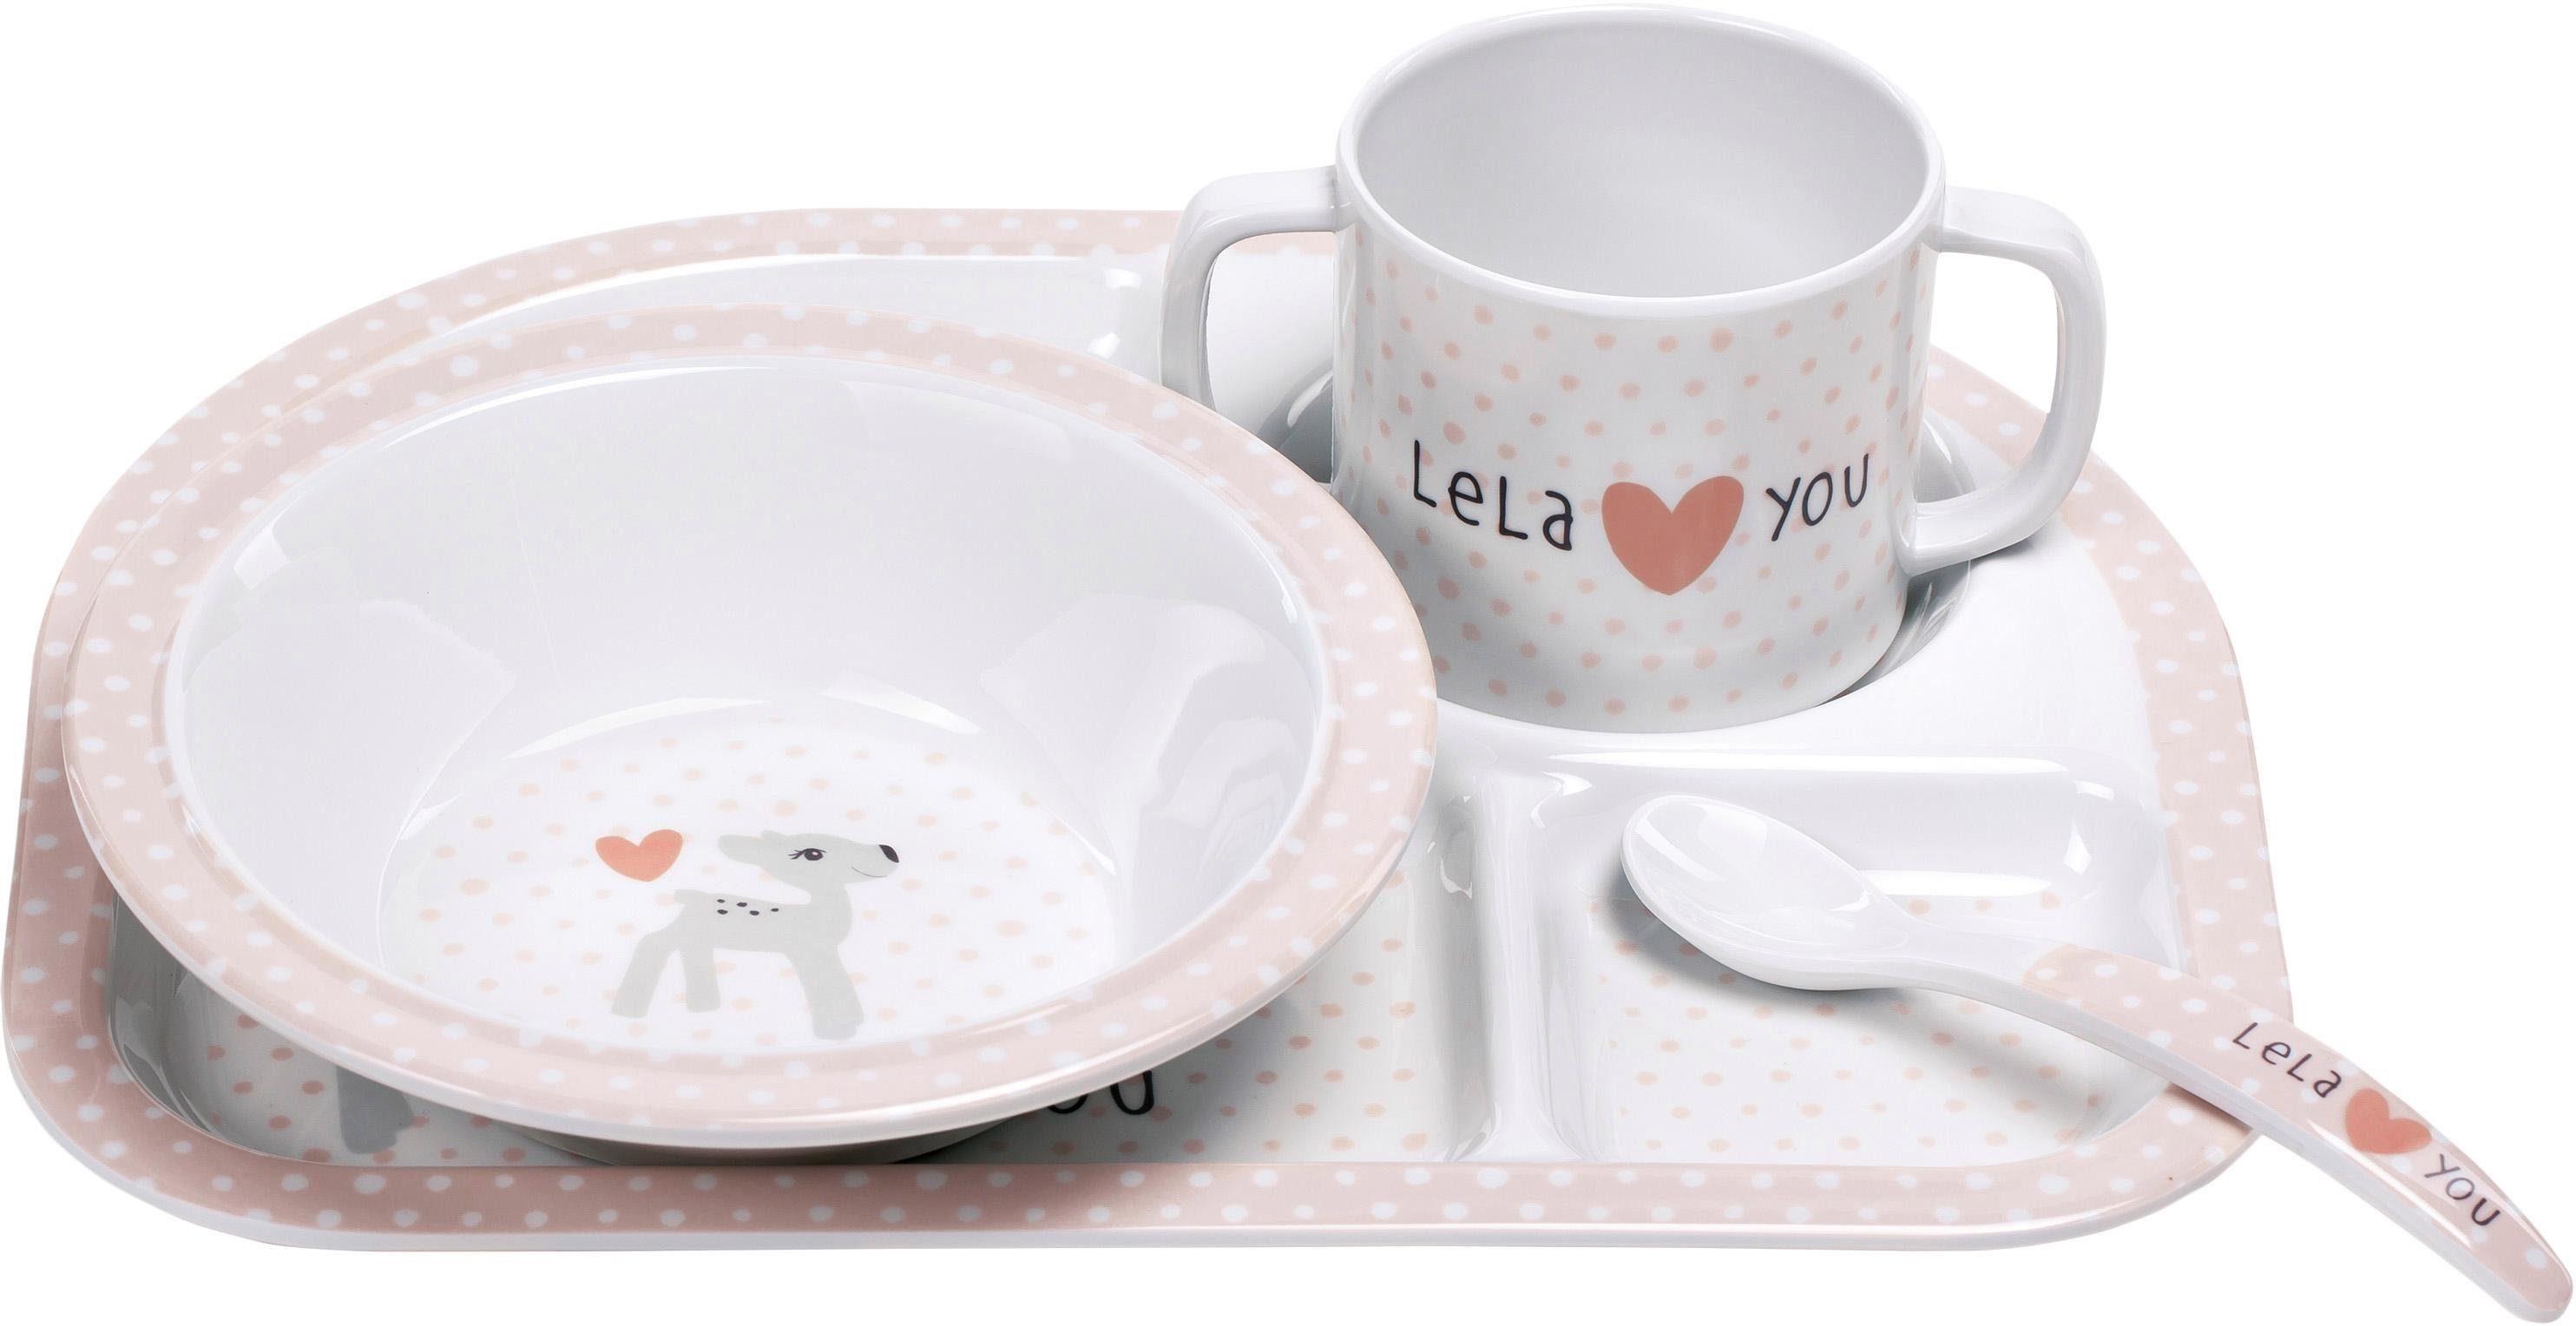 Lässig Kindergeschirr Set, 4-tlg., »Dish Set, Lela Light Pink«